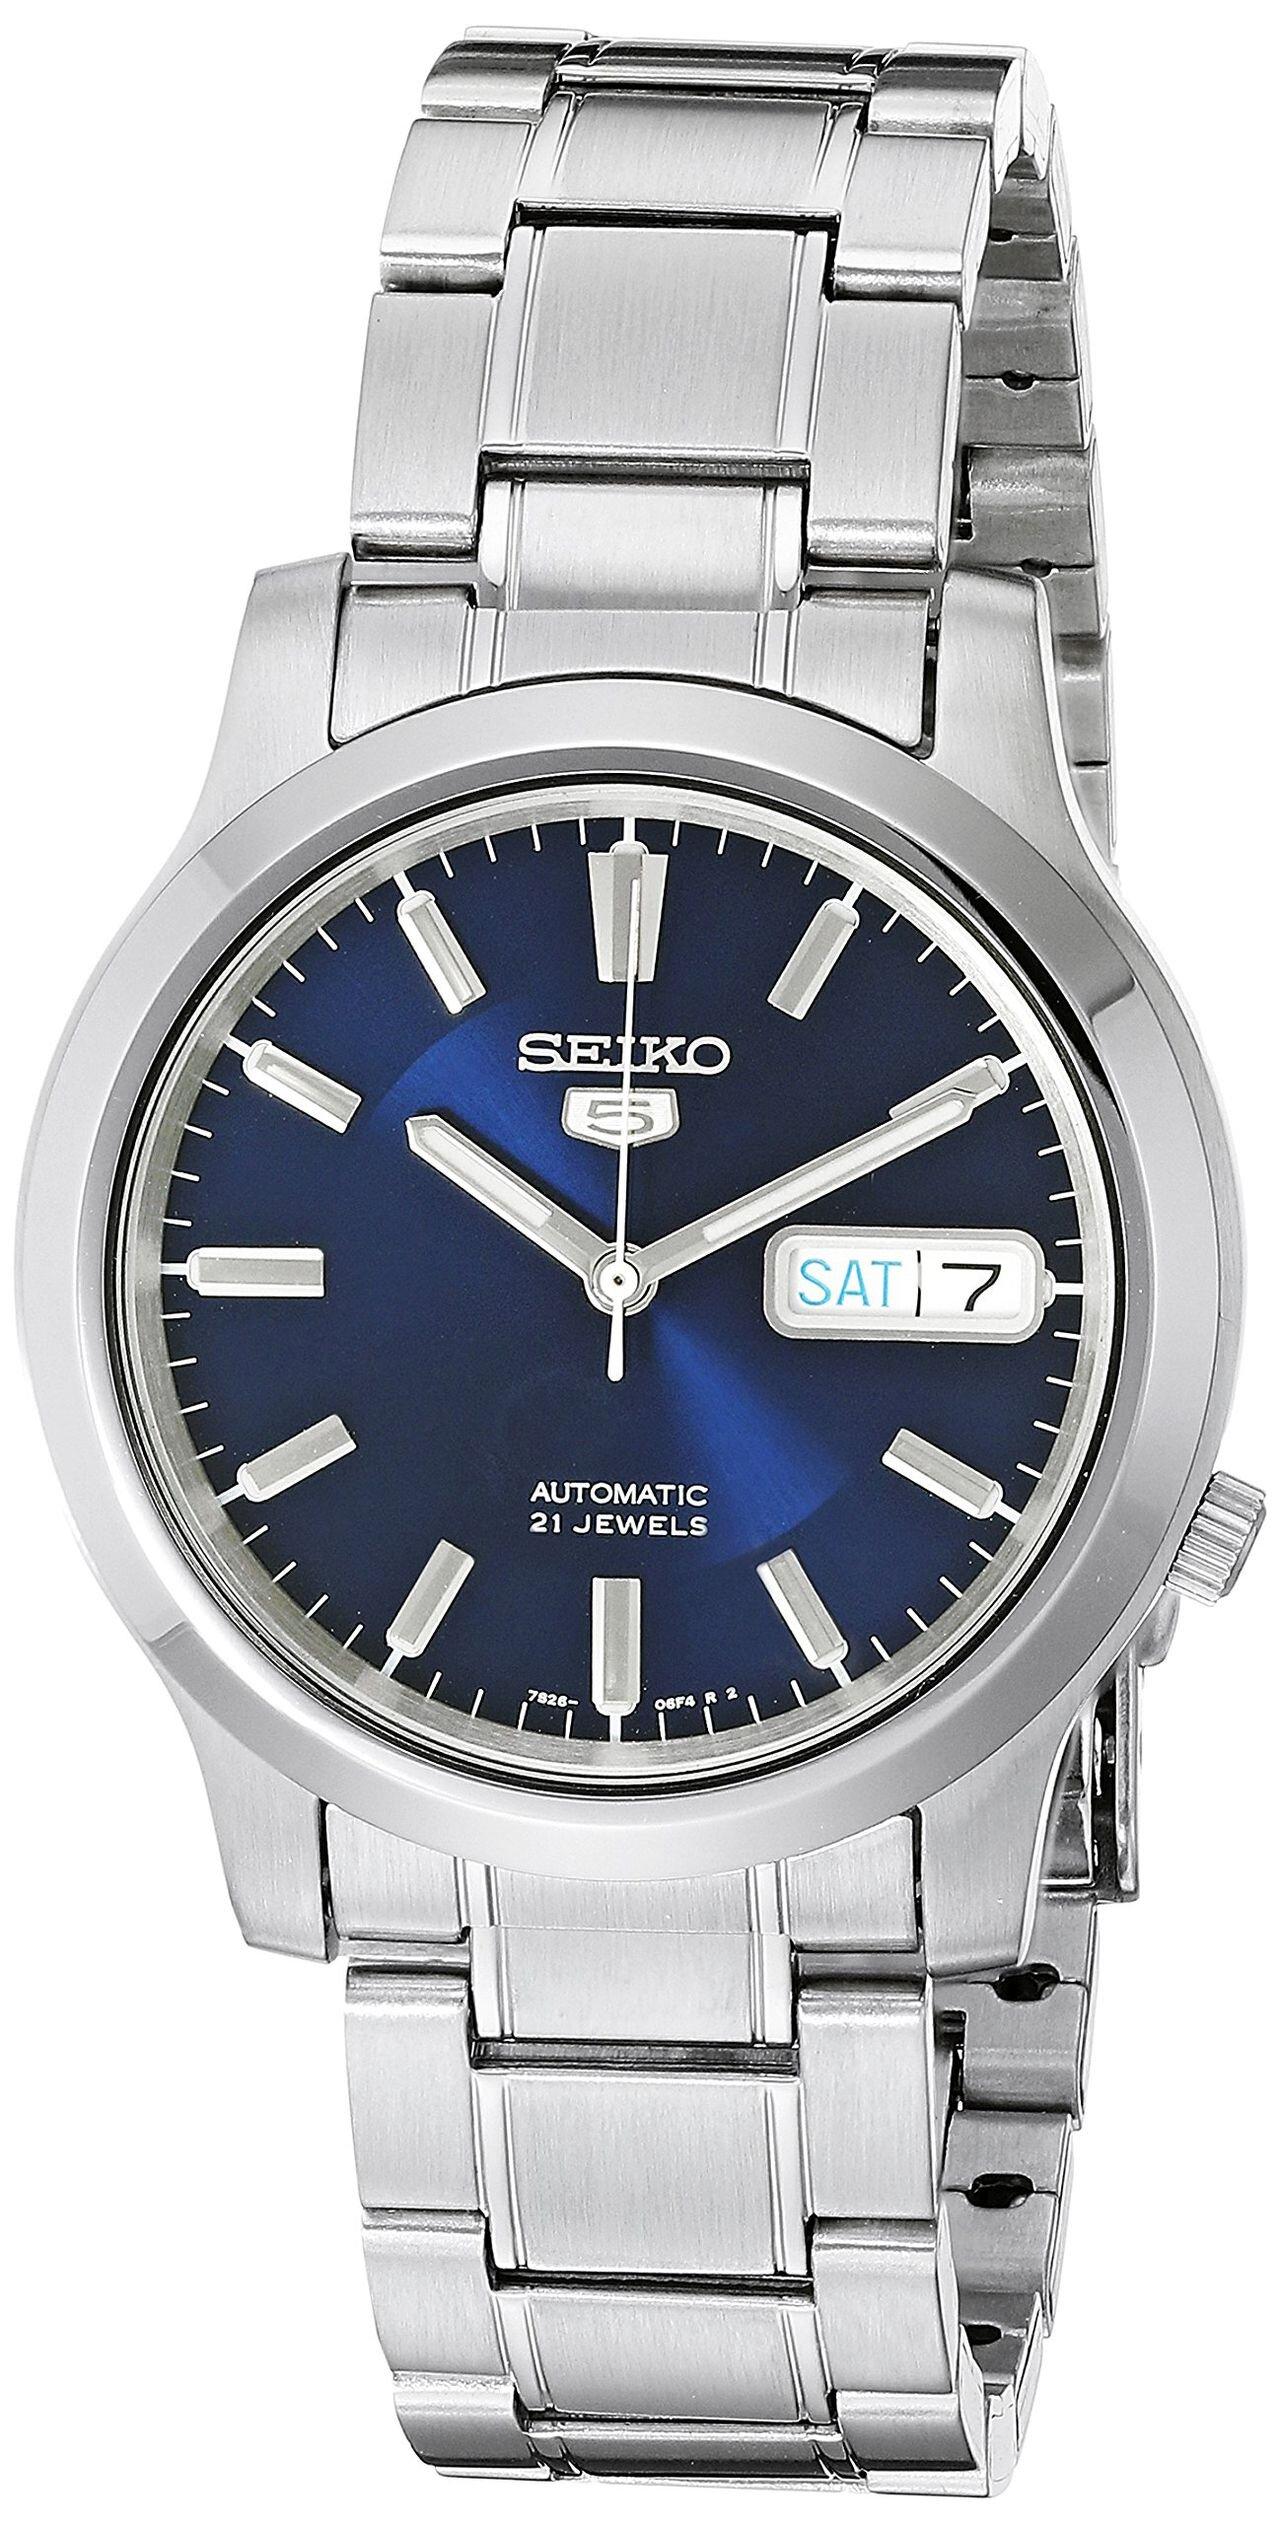 Đồng hồ nam Seiko SNK793